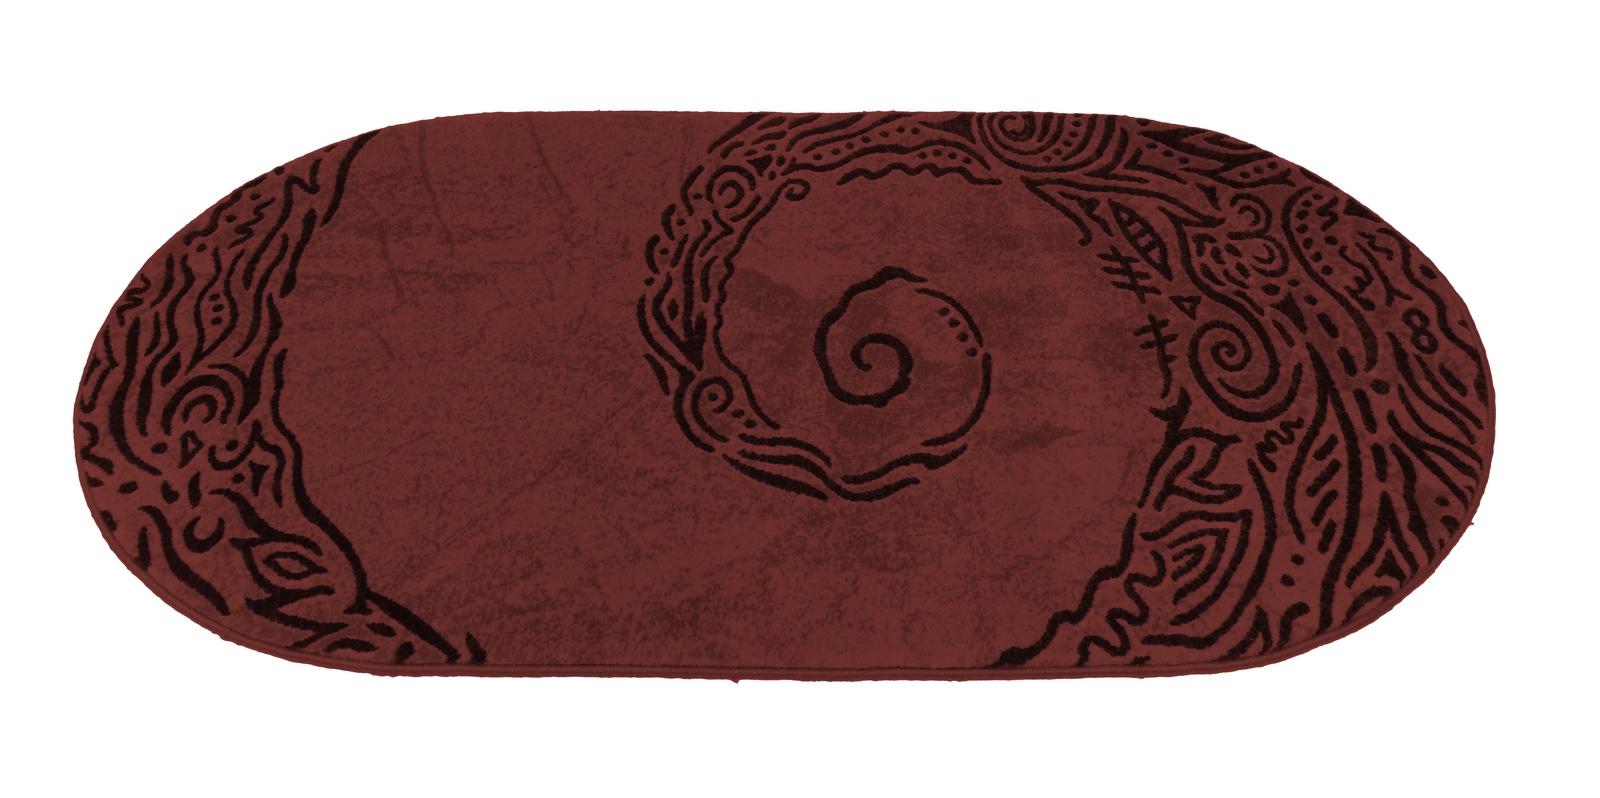 Ковер MADONNA 0,8х1,5/овал/80069AO/красный/MADONNA bossa n madonna the ultimate electro bossa tribute album to madonna